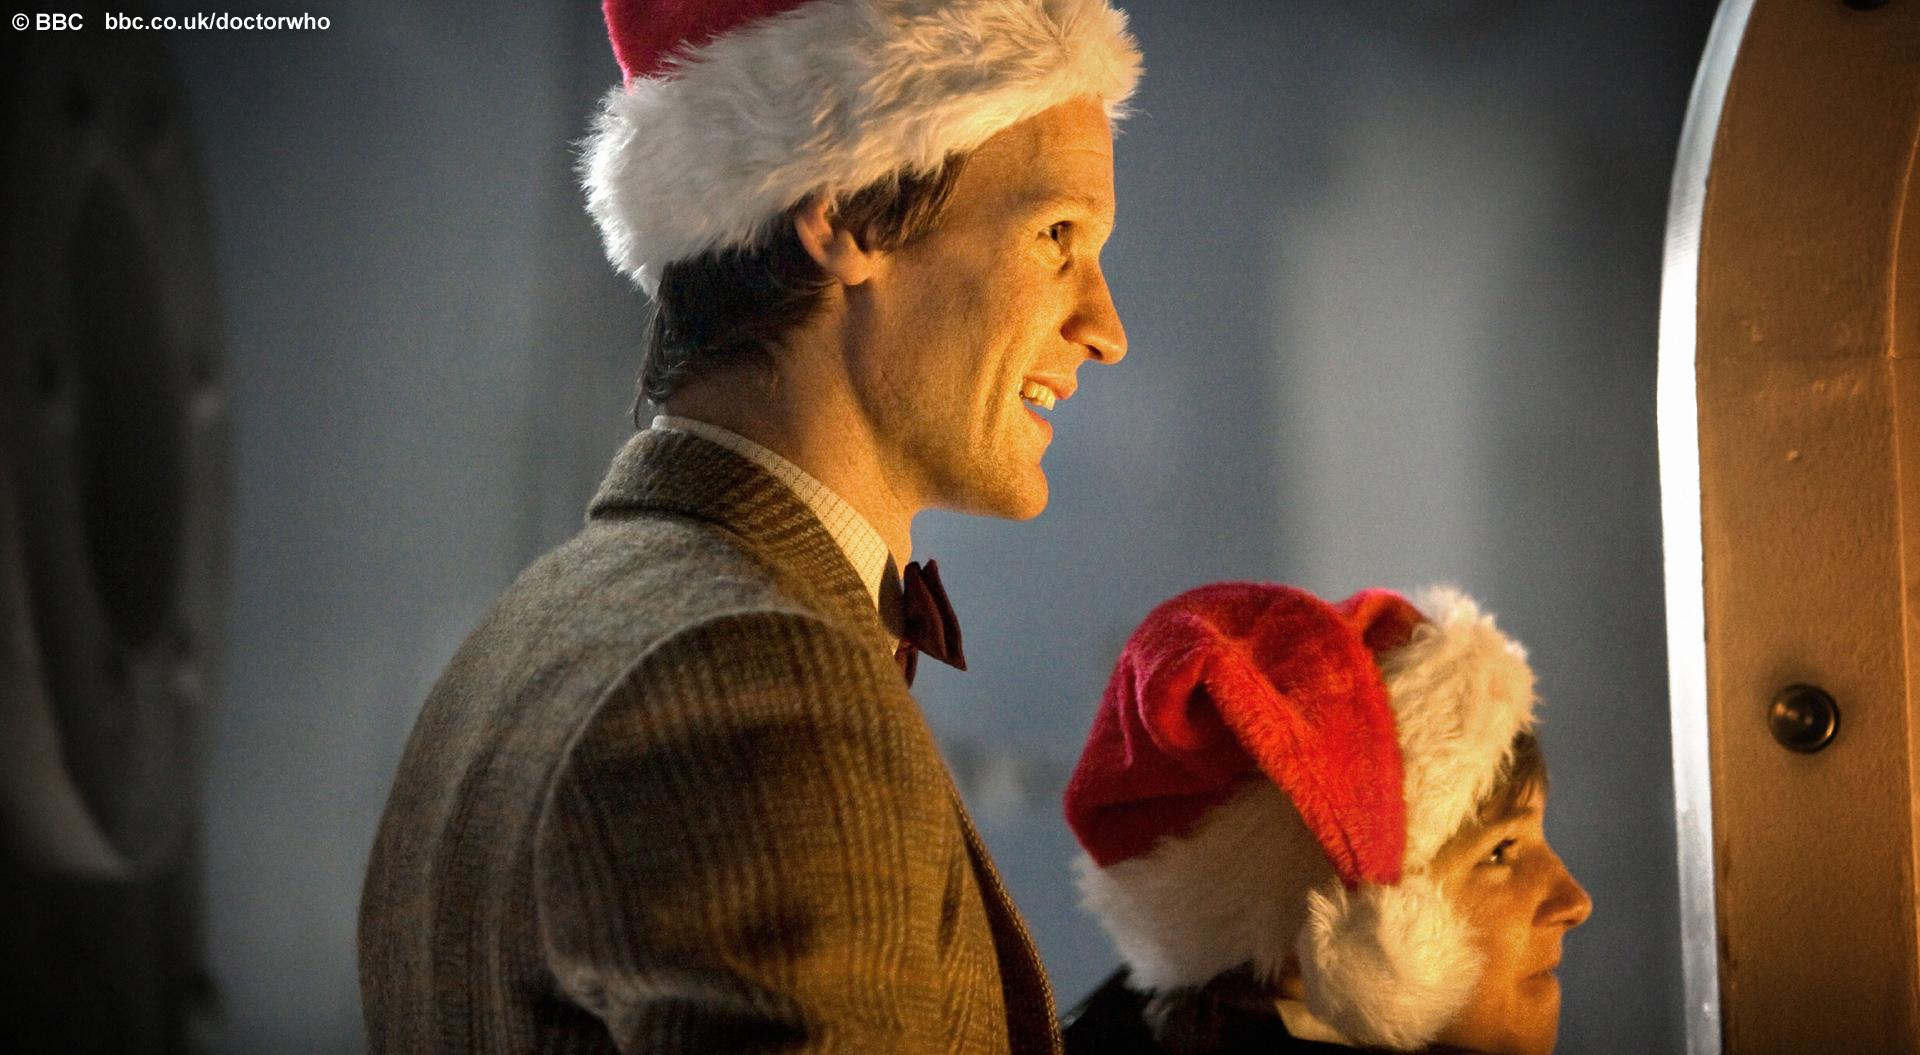 Dr Who Christmas Special: Christmas Carol wallpapers